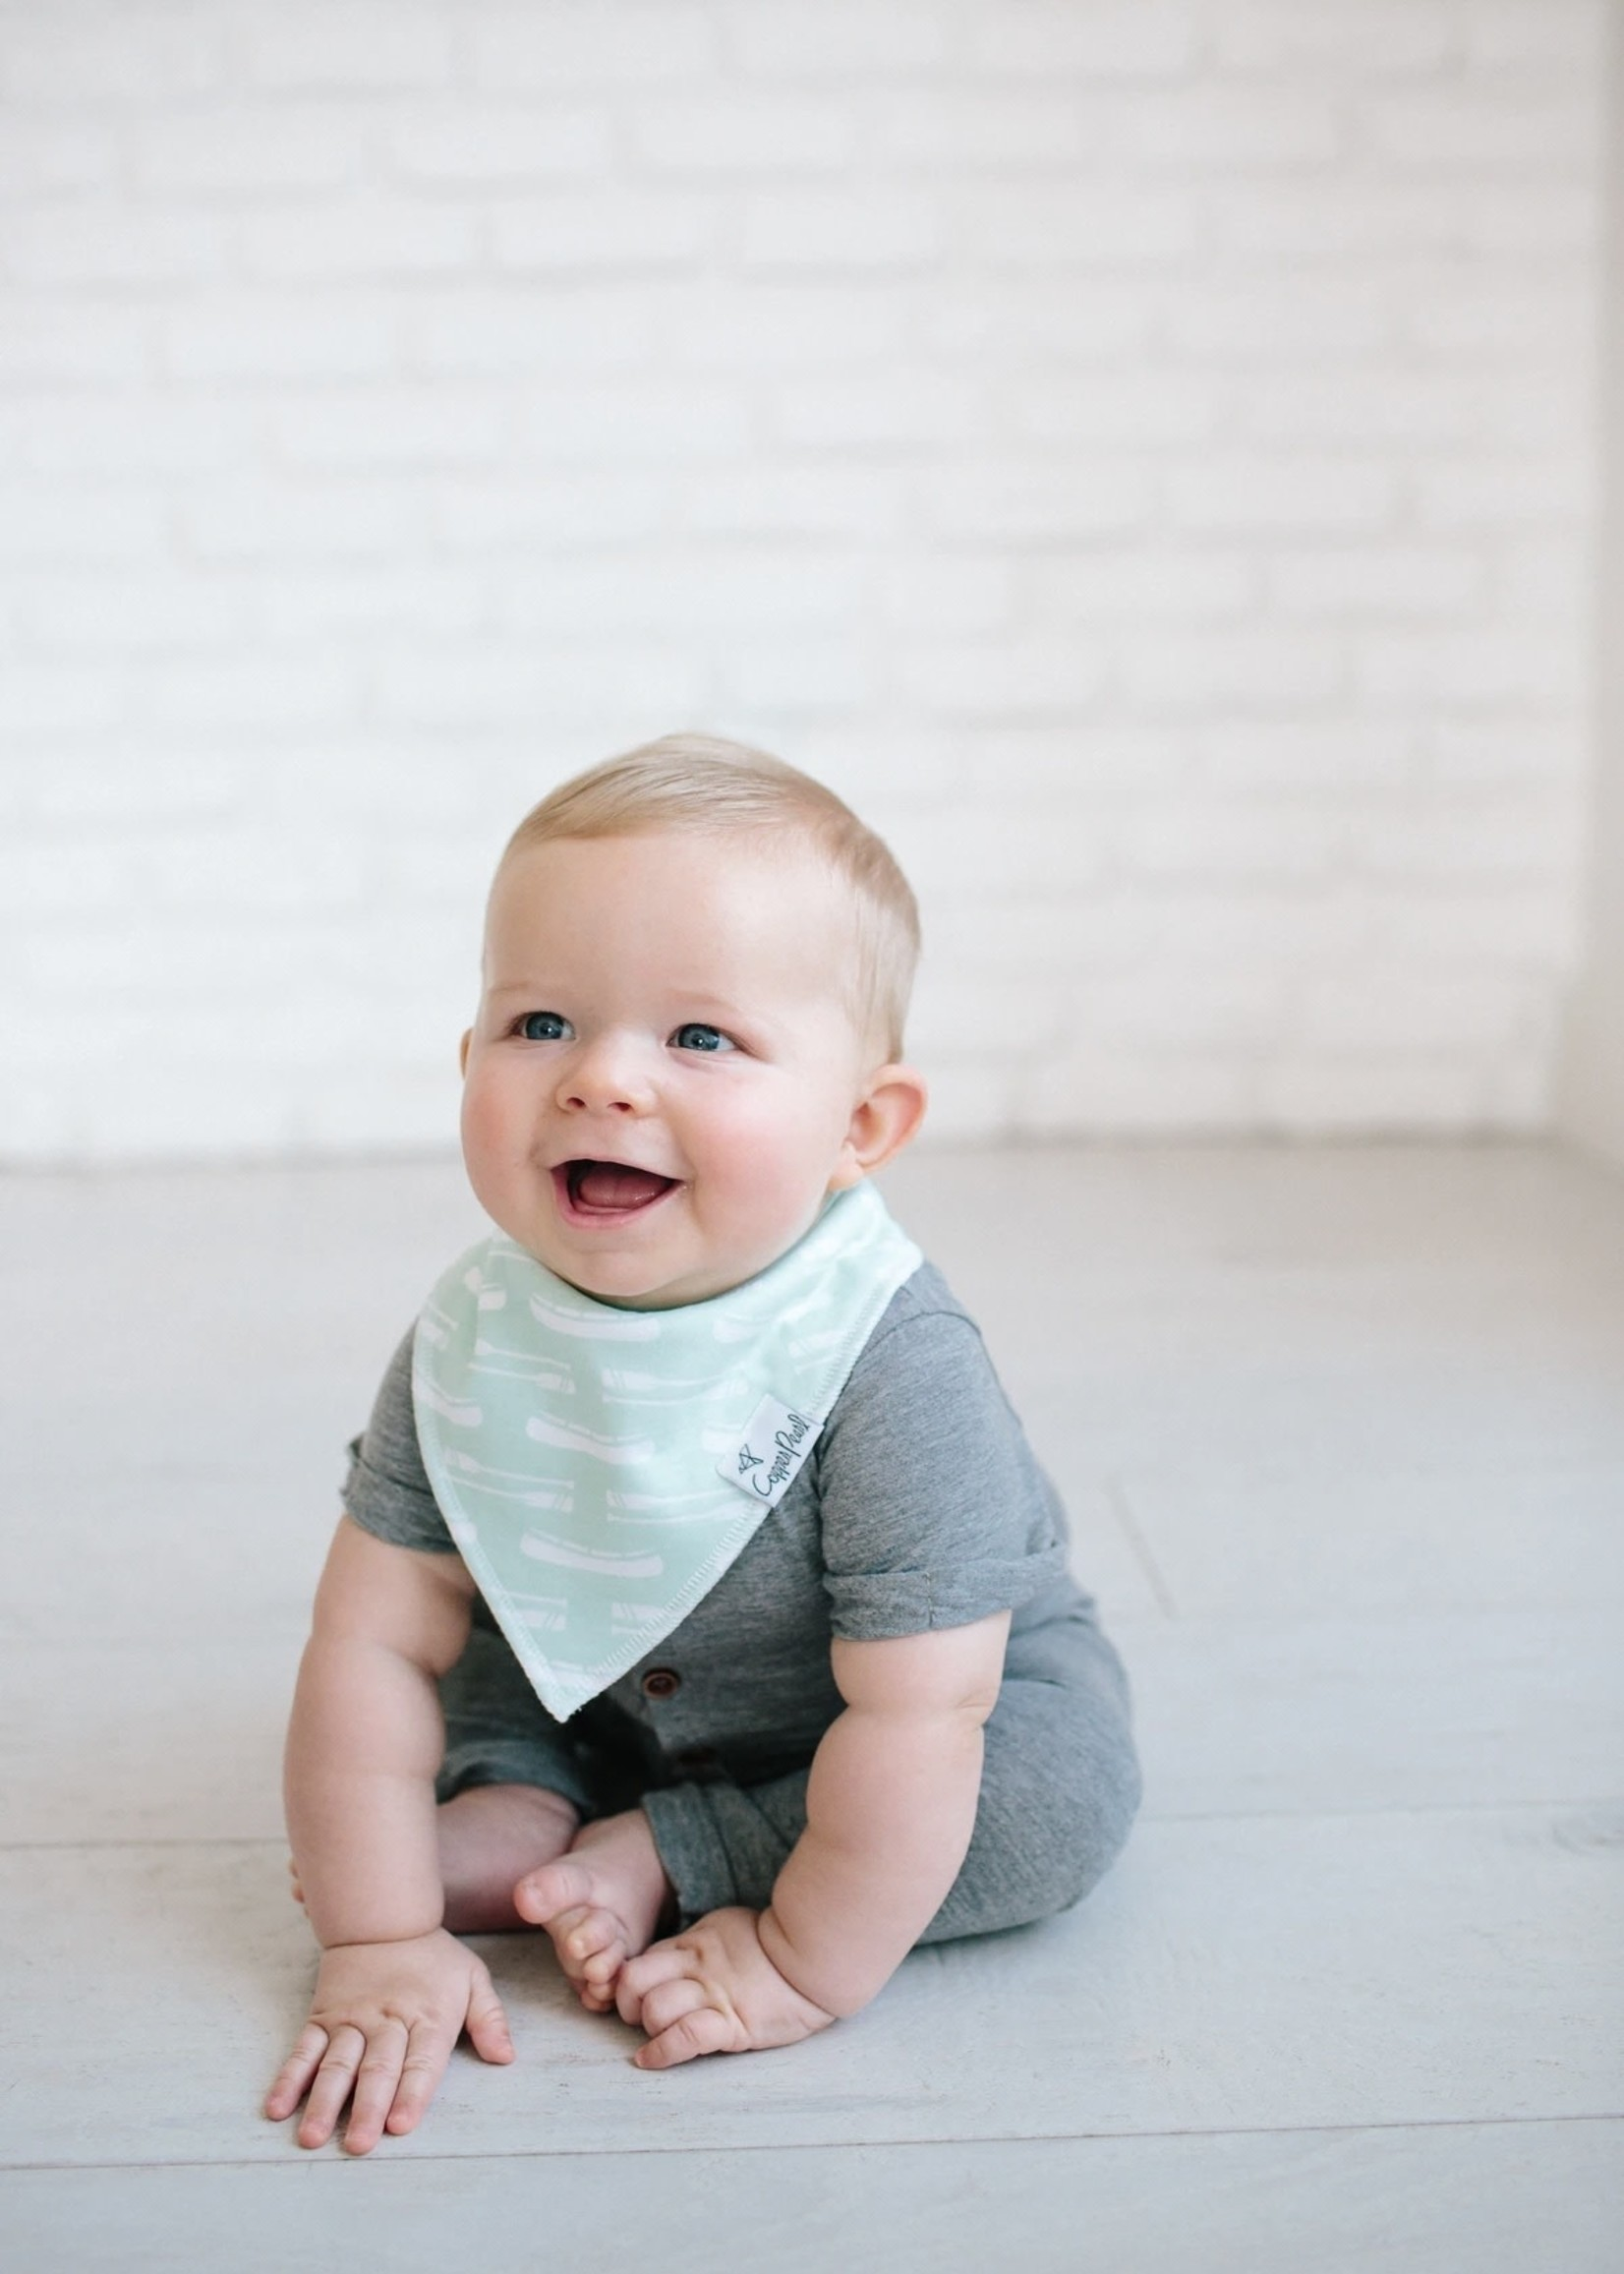 COPPER PEARL 4-pack Baby Bandana Bibs - SCOUT